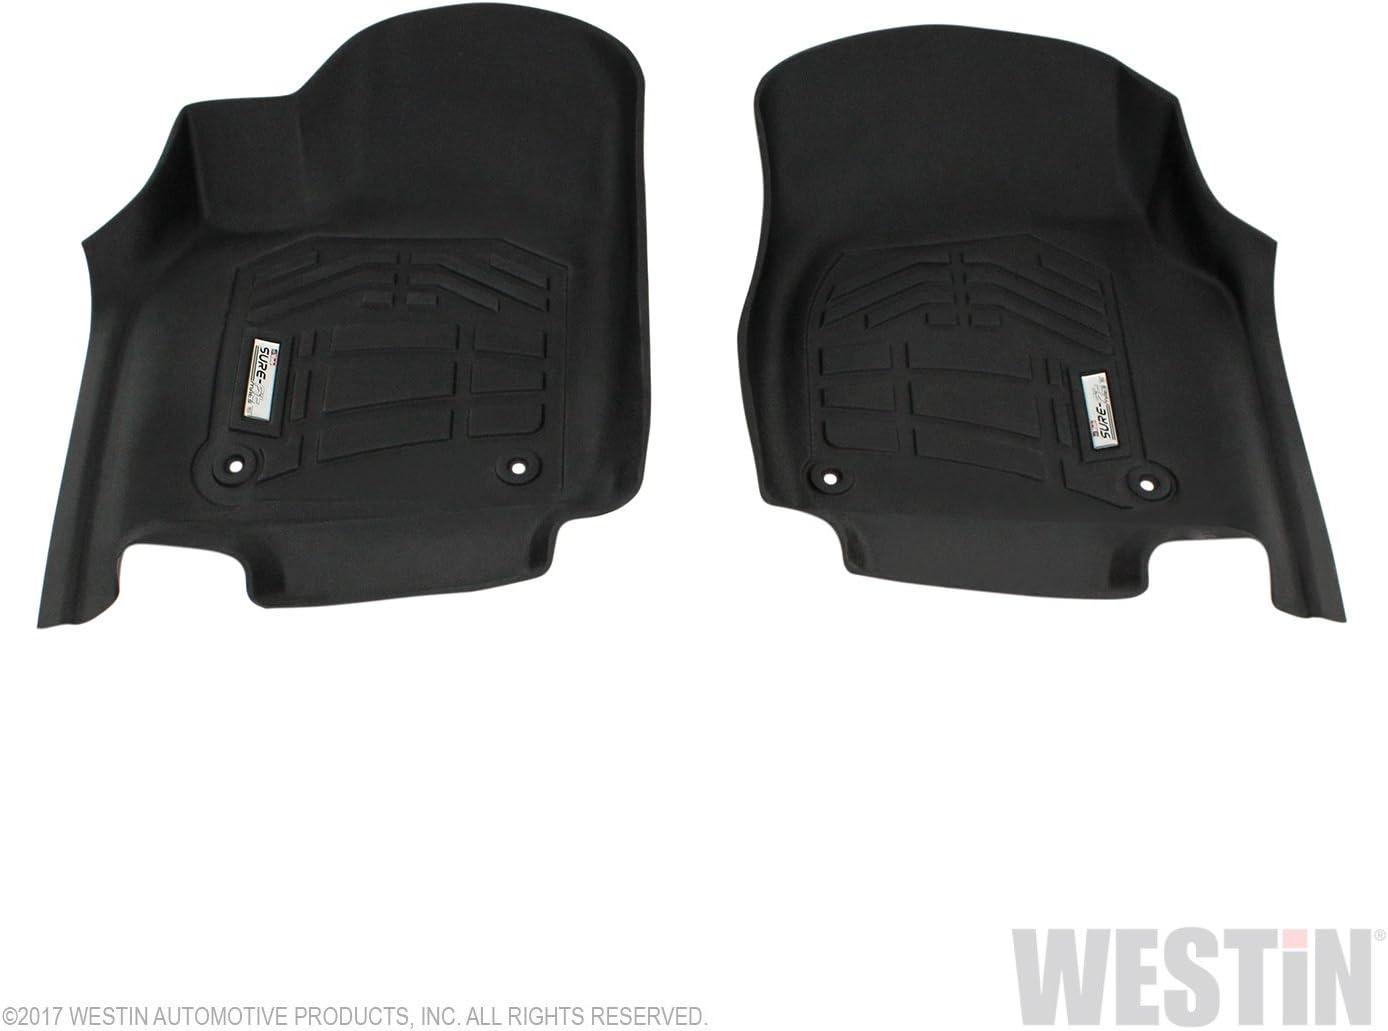 Westin Automotive Product 72-110094 Max 85% OFF Black Pack 1 Popular overseas Floor Mat